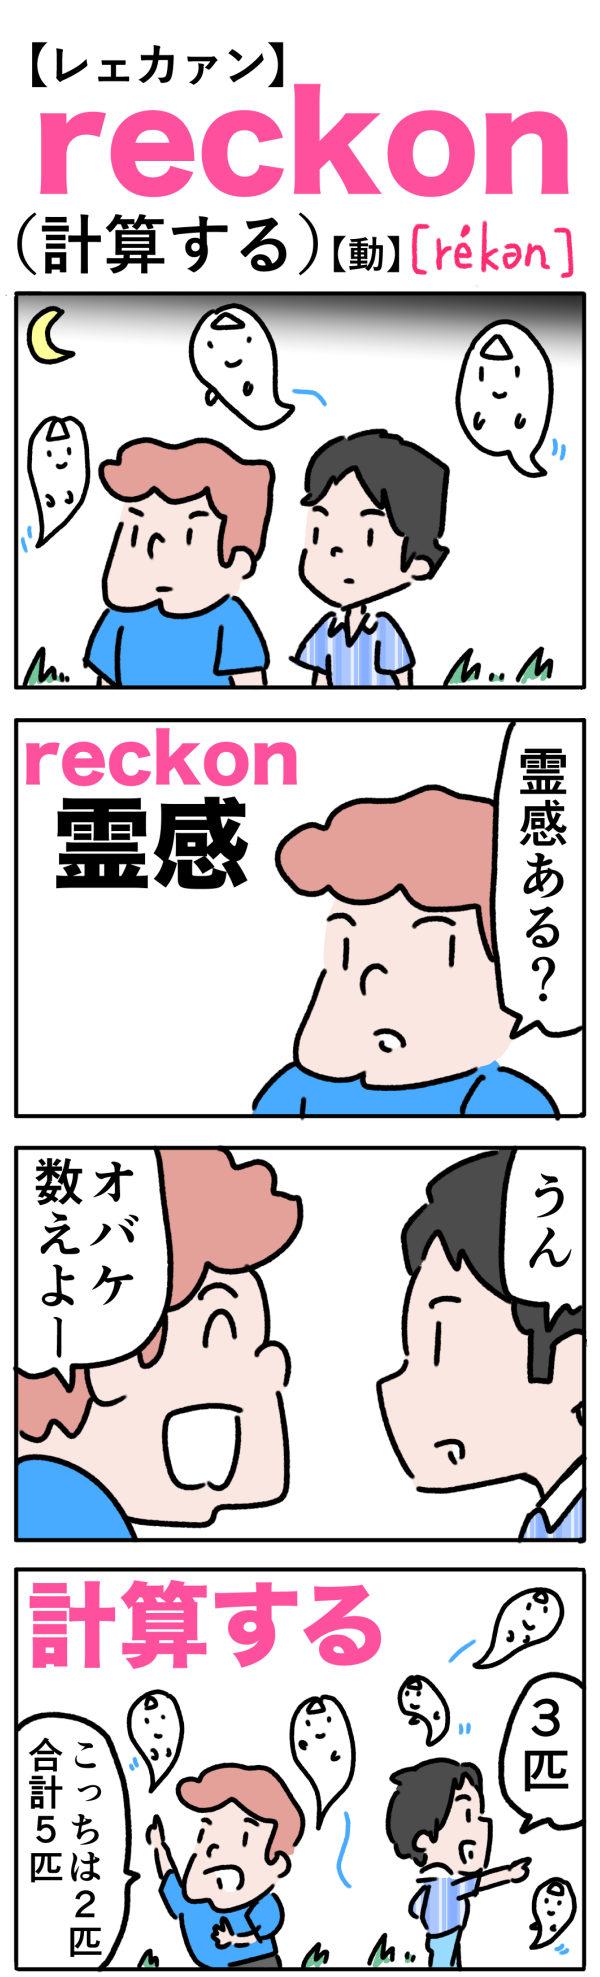 reckon(計算する)の語呂合わせ英単語